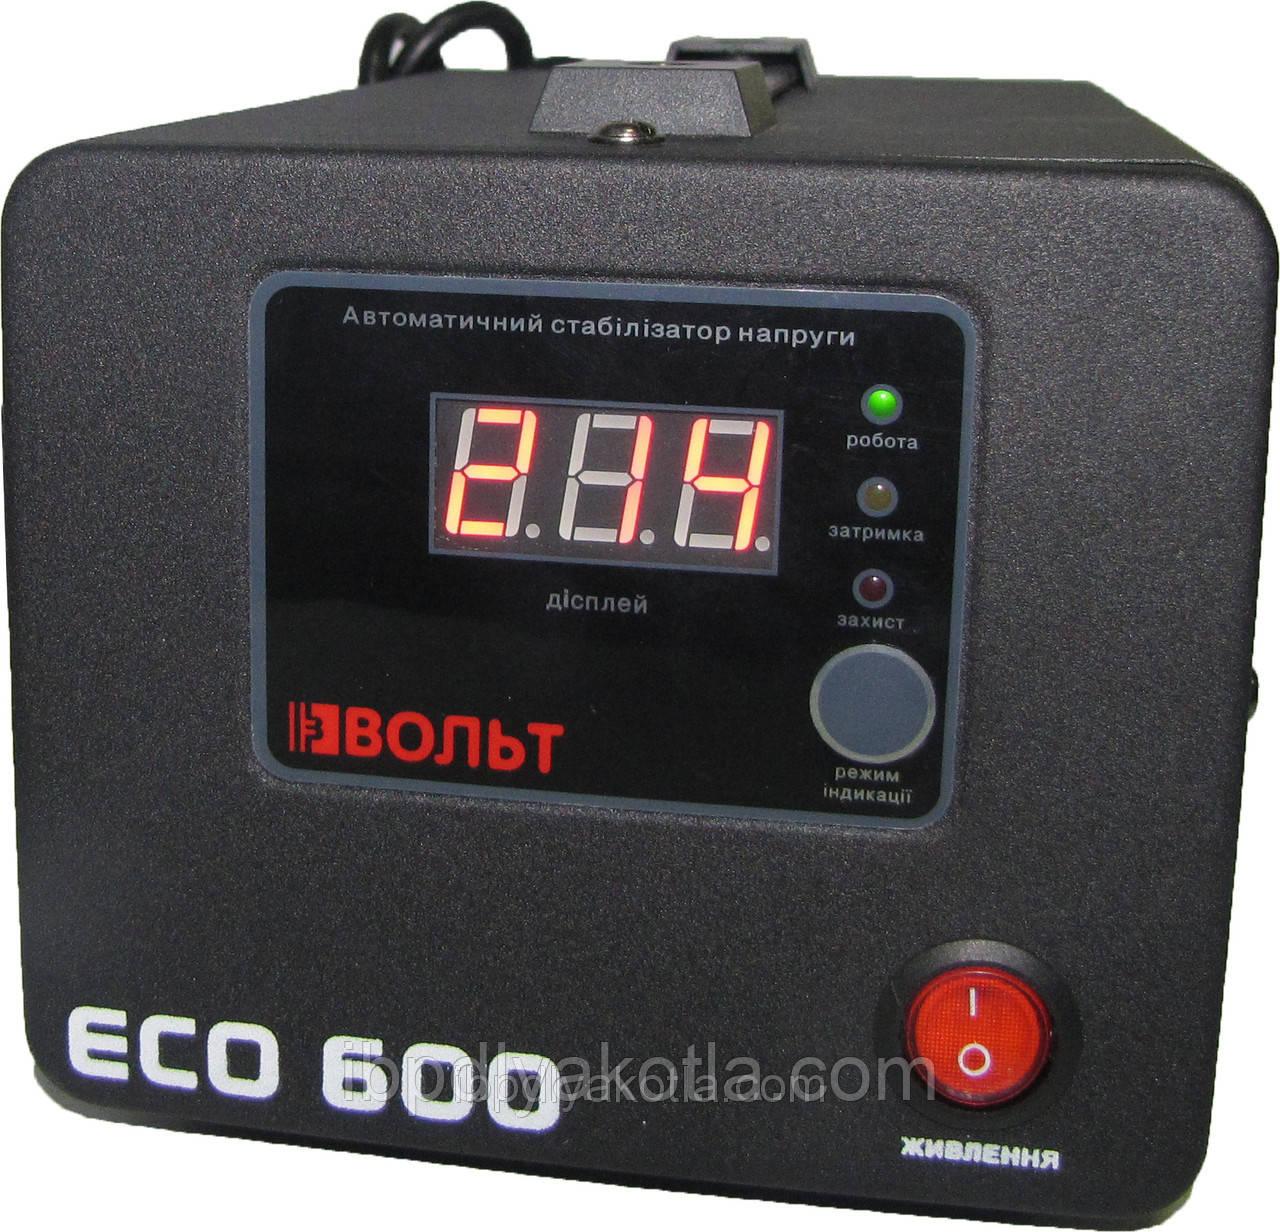 Вольт ECO-600